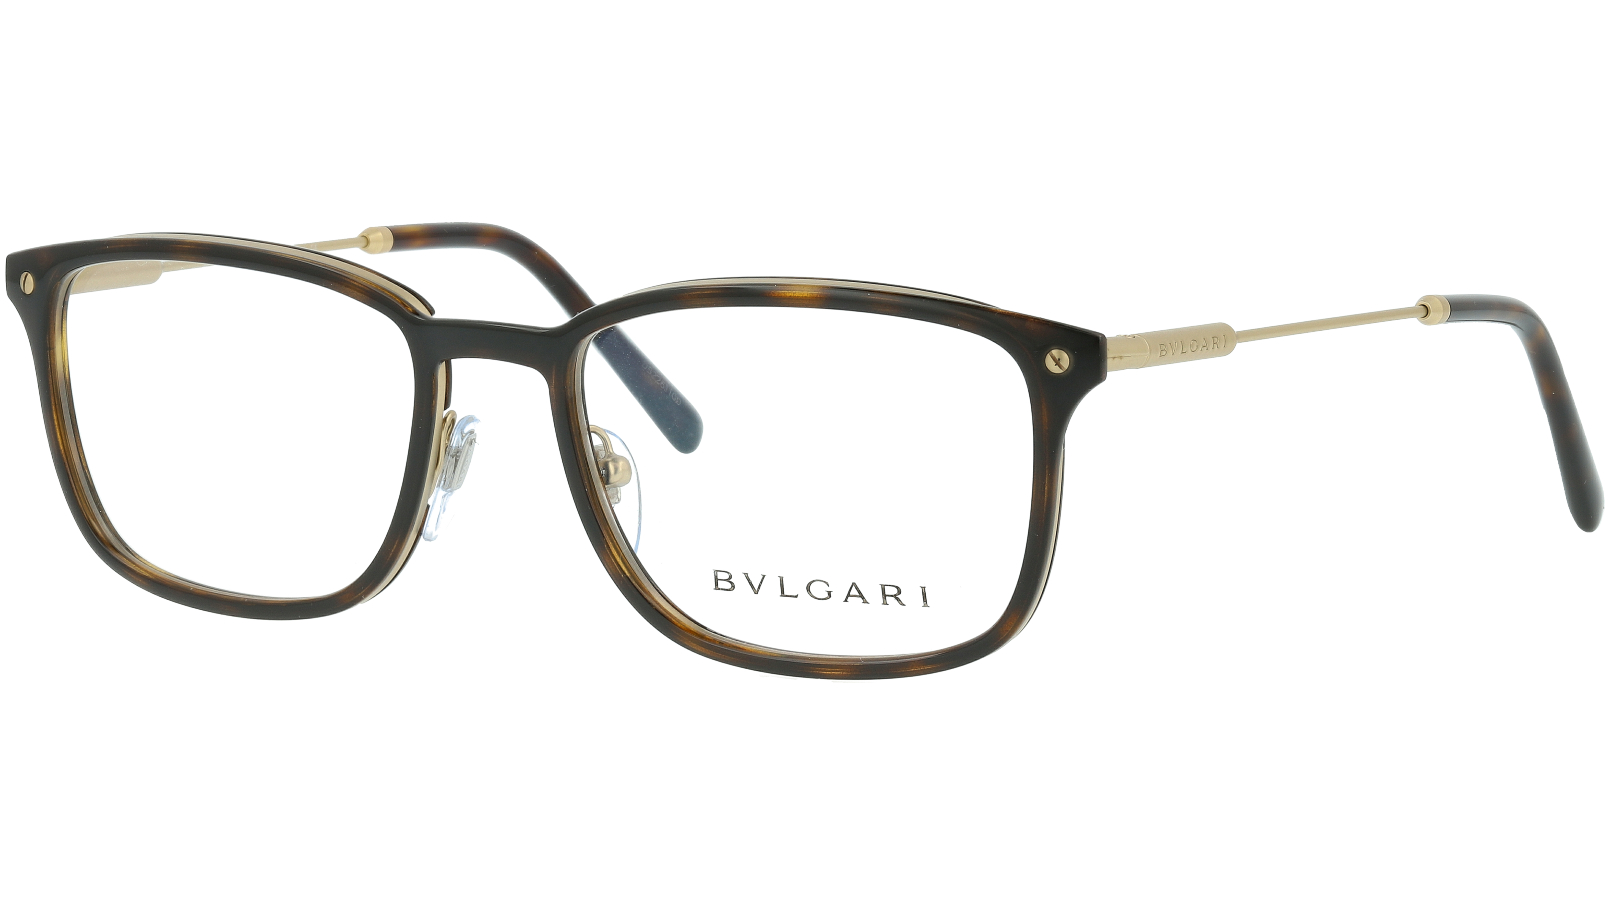 BVLGARI BV1101 2022 54 HAVANA Glasses